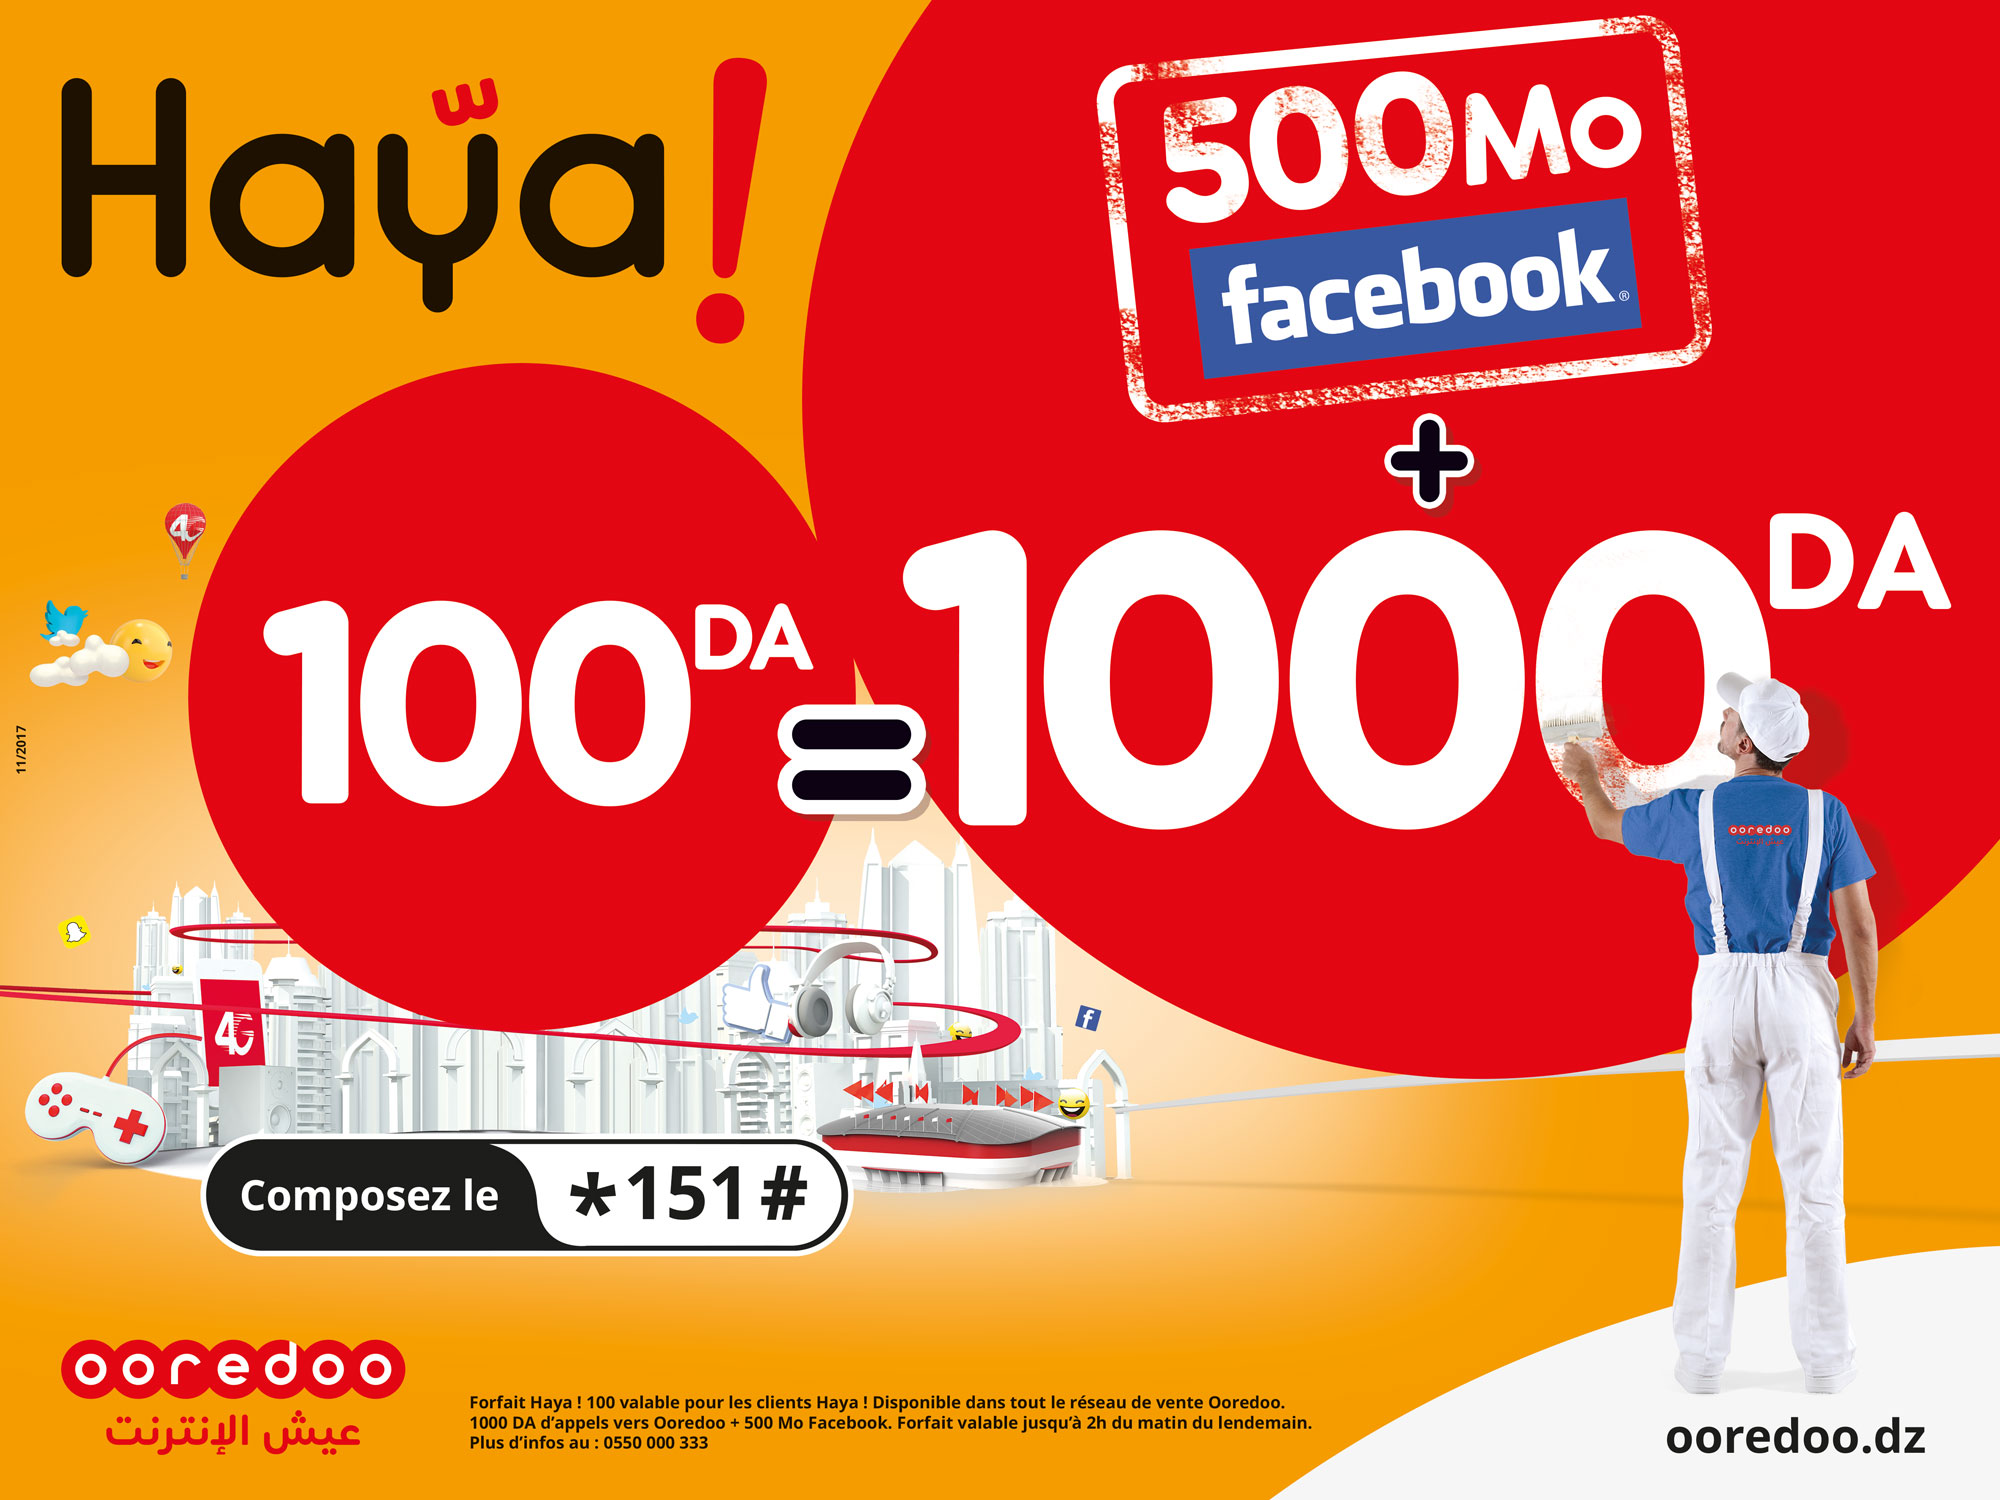 DIA-Le forfait Haya! 100 de Ooredoo devient permanent